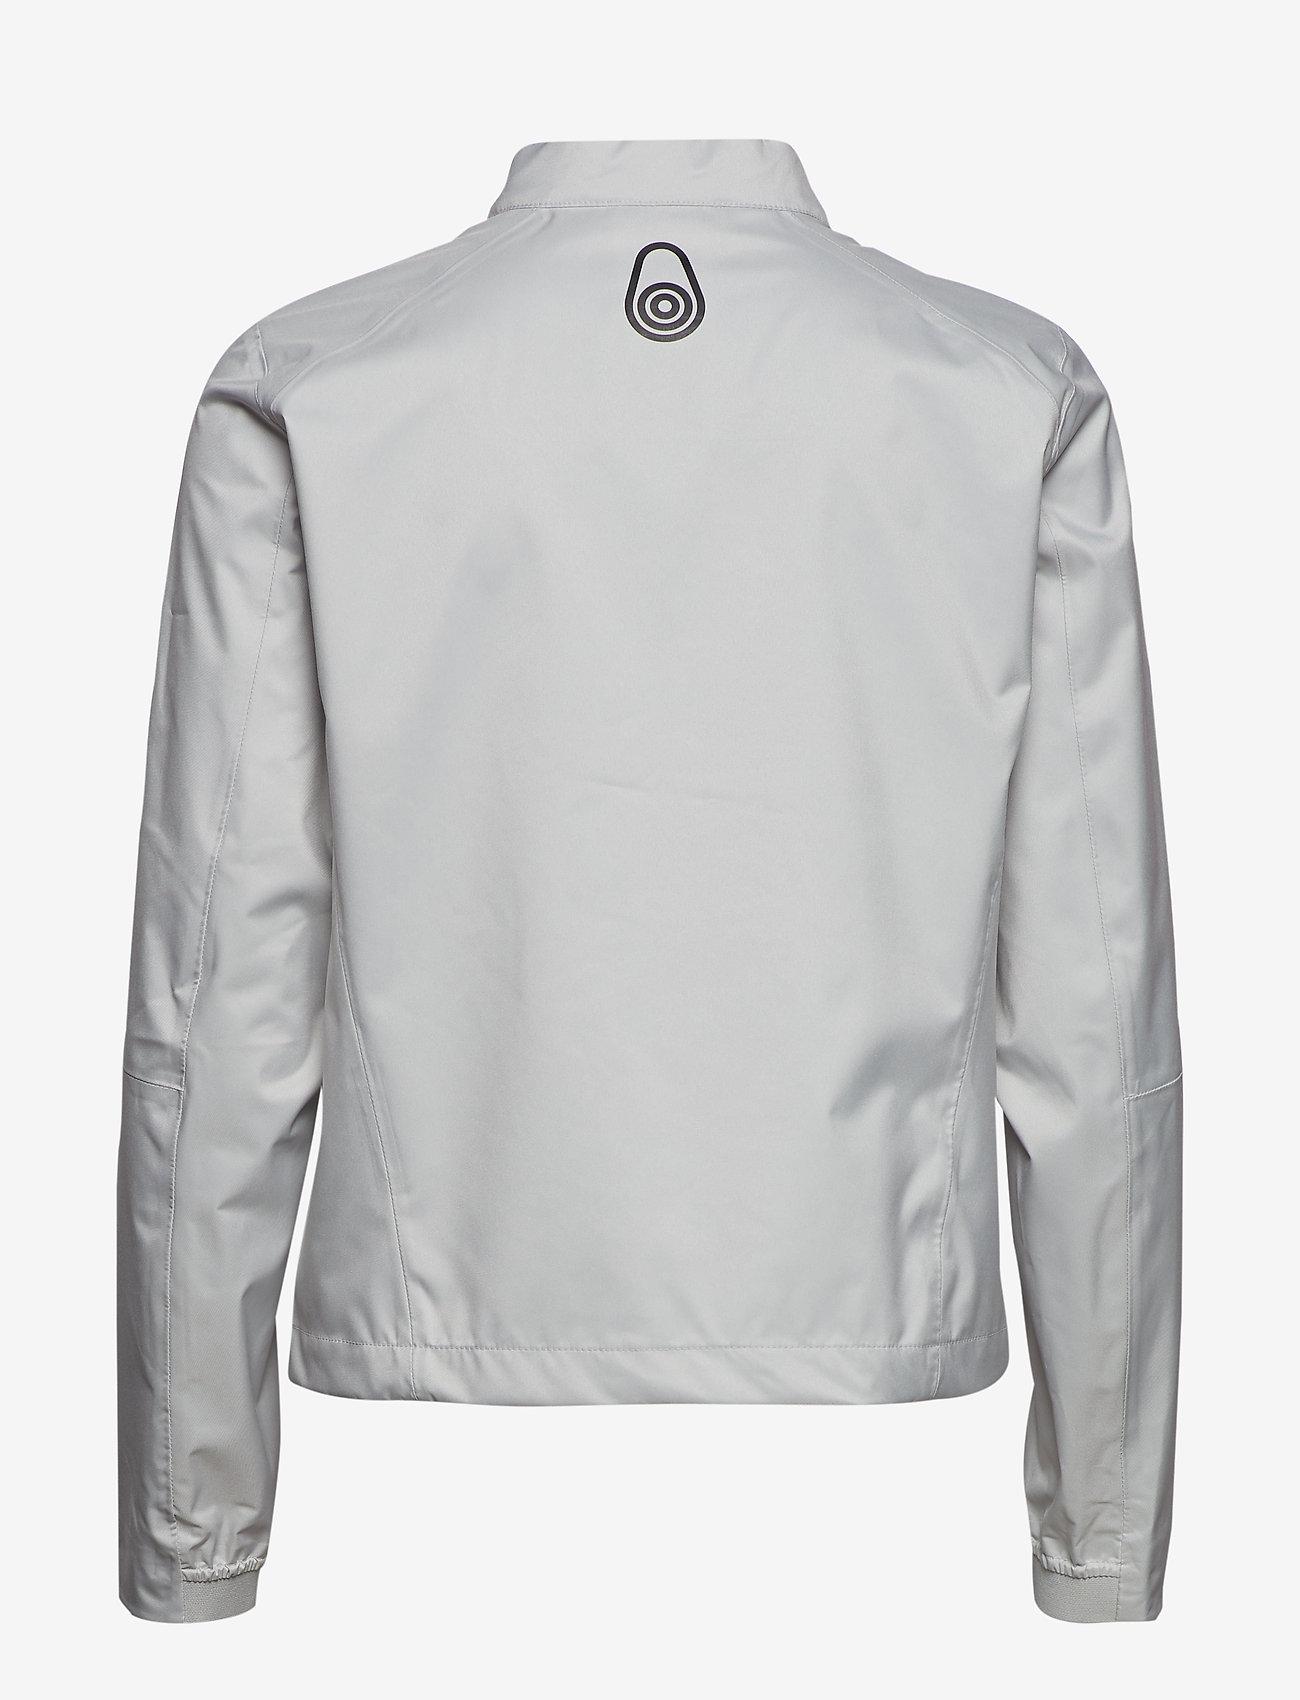 Sail Racing - W GALE TECHNICAL JACKET - outdoor & rain jackets - glacier grey - 1